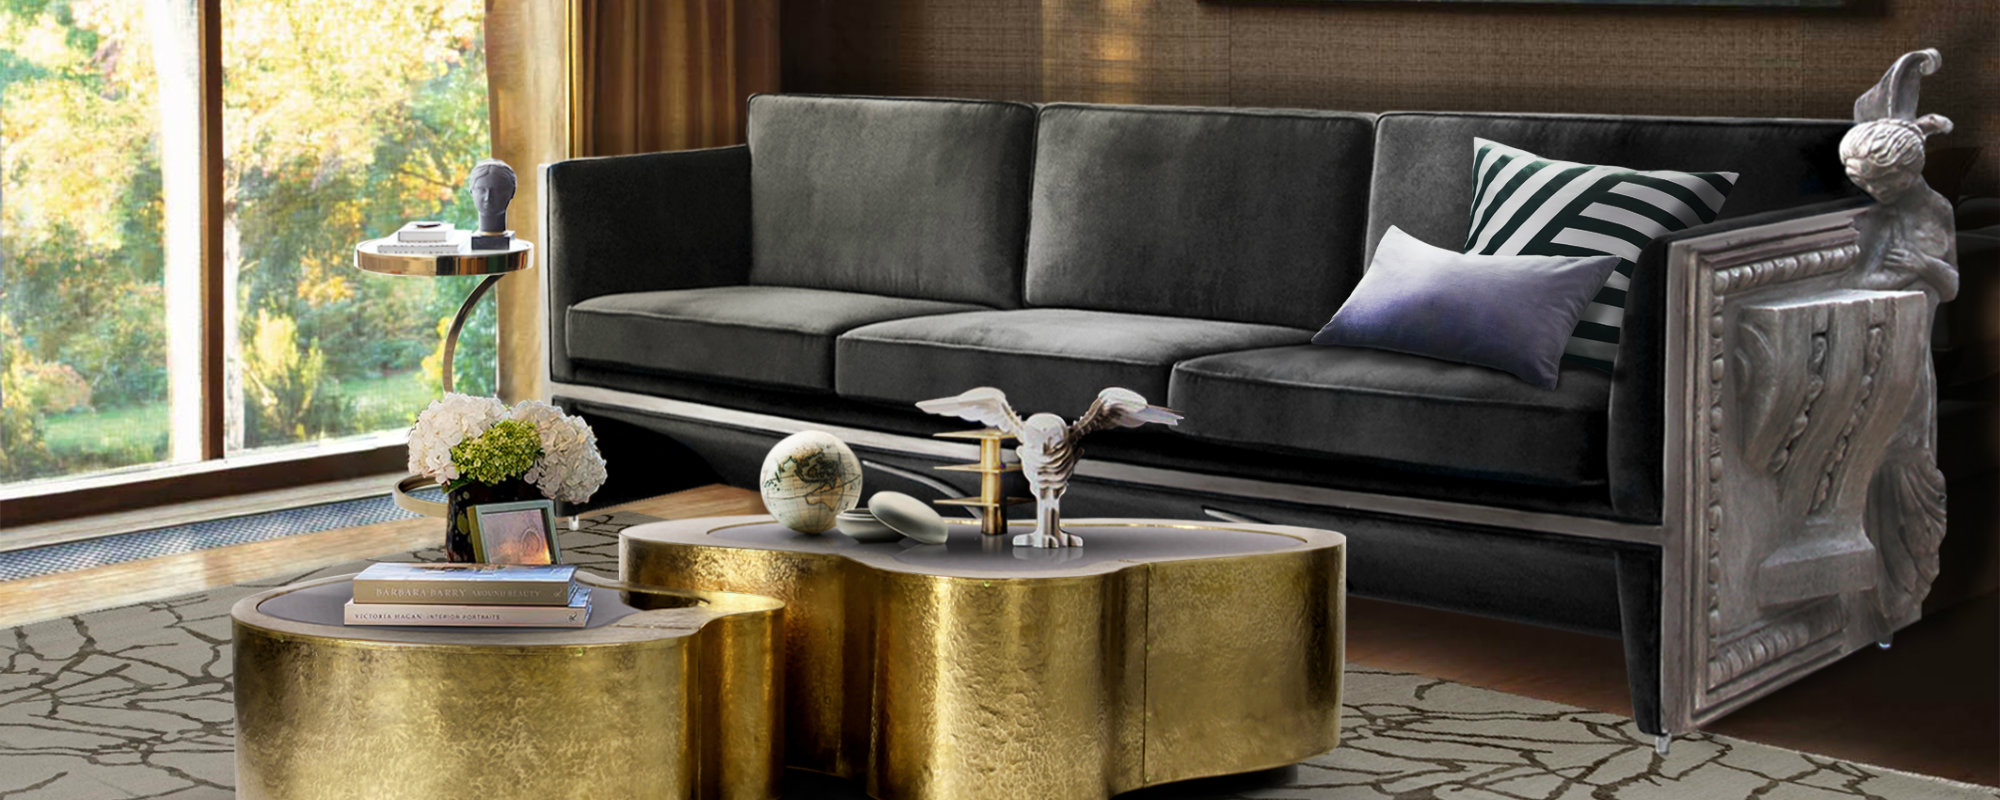 Tendencias de Decoración: Ideas para tú sala de estar